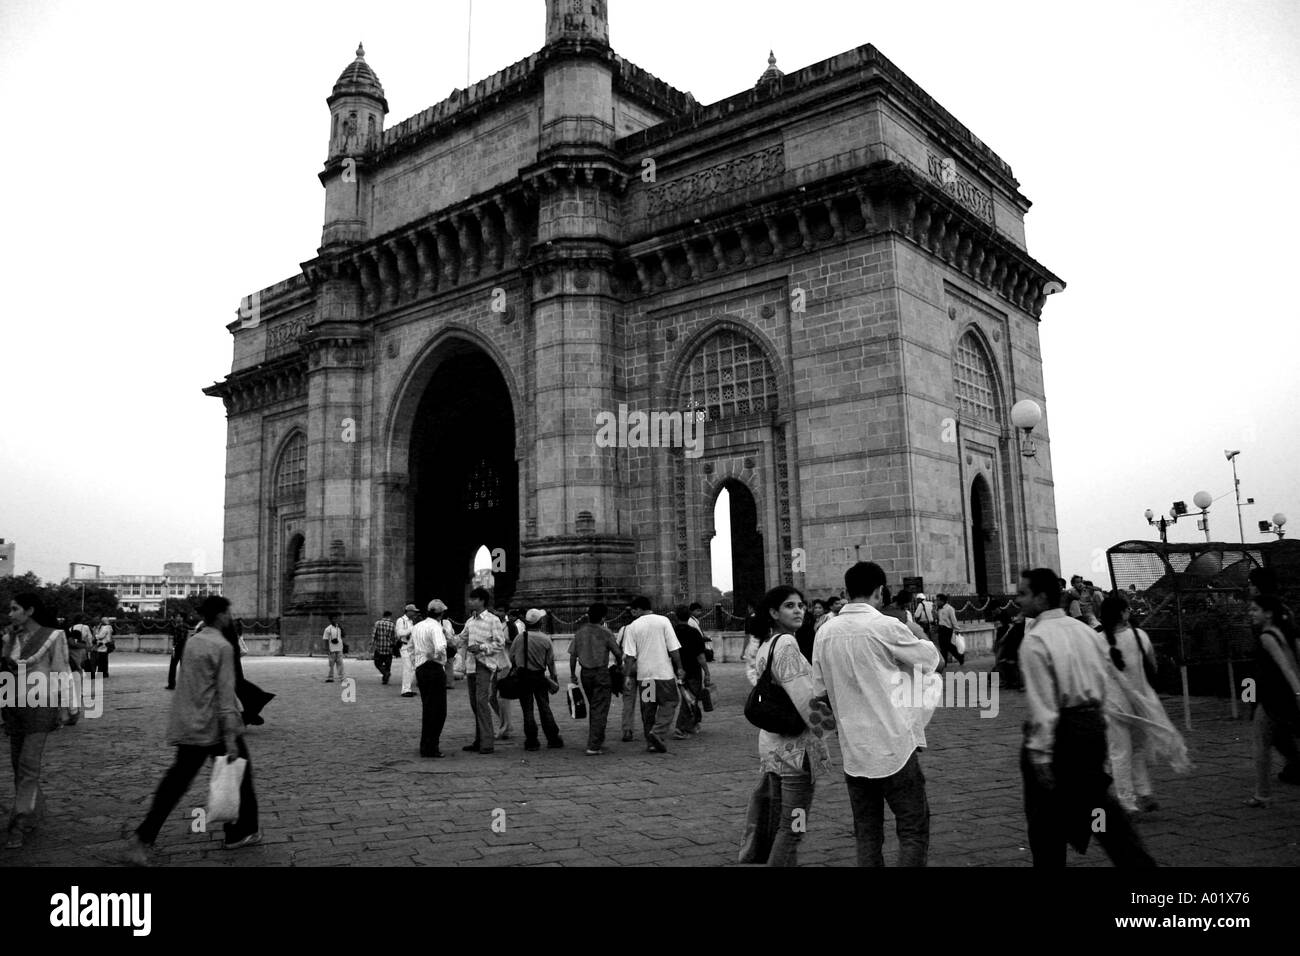 Gateway of India people strolling in the evening Bombay now Mumbai Maharastra India - Stock Image